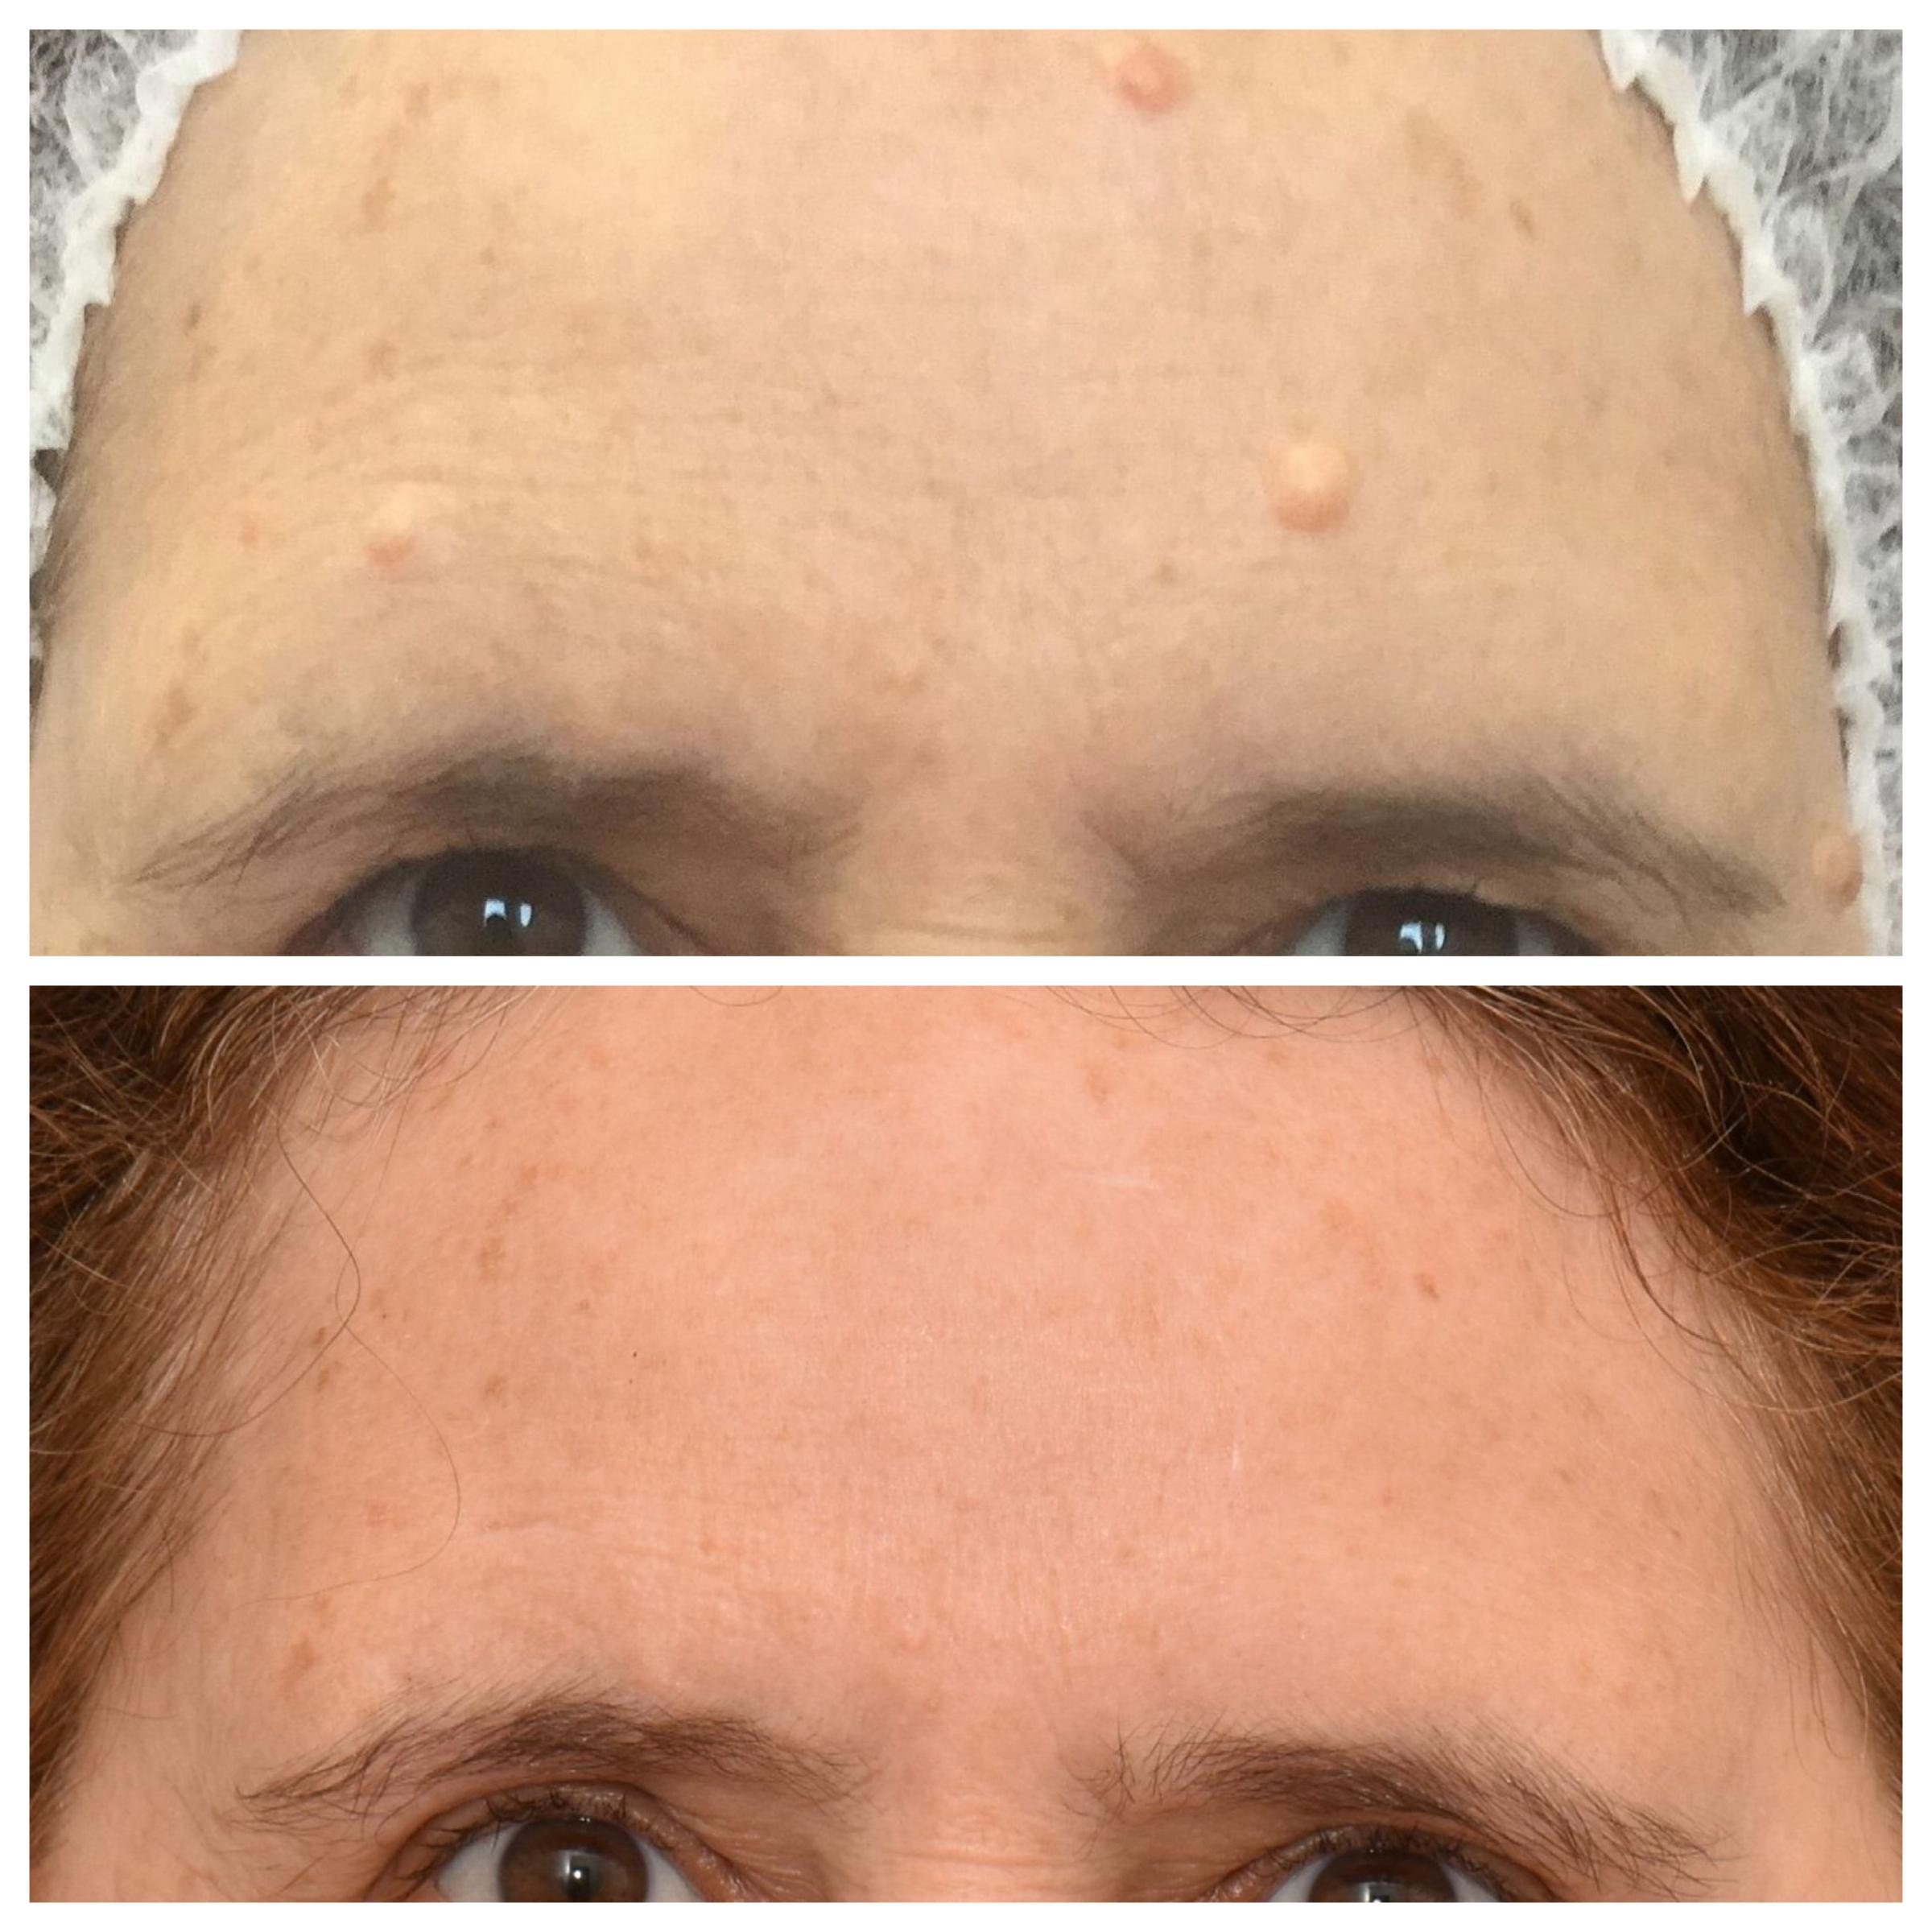 Mole Skin Tag Wart Removal Northern Skin Studio